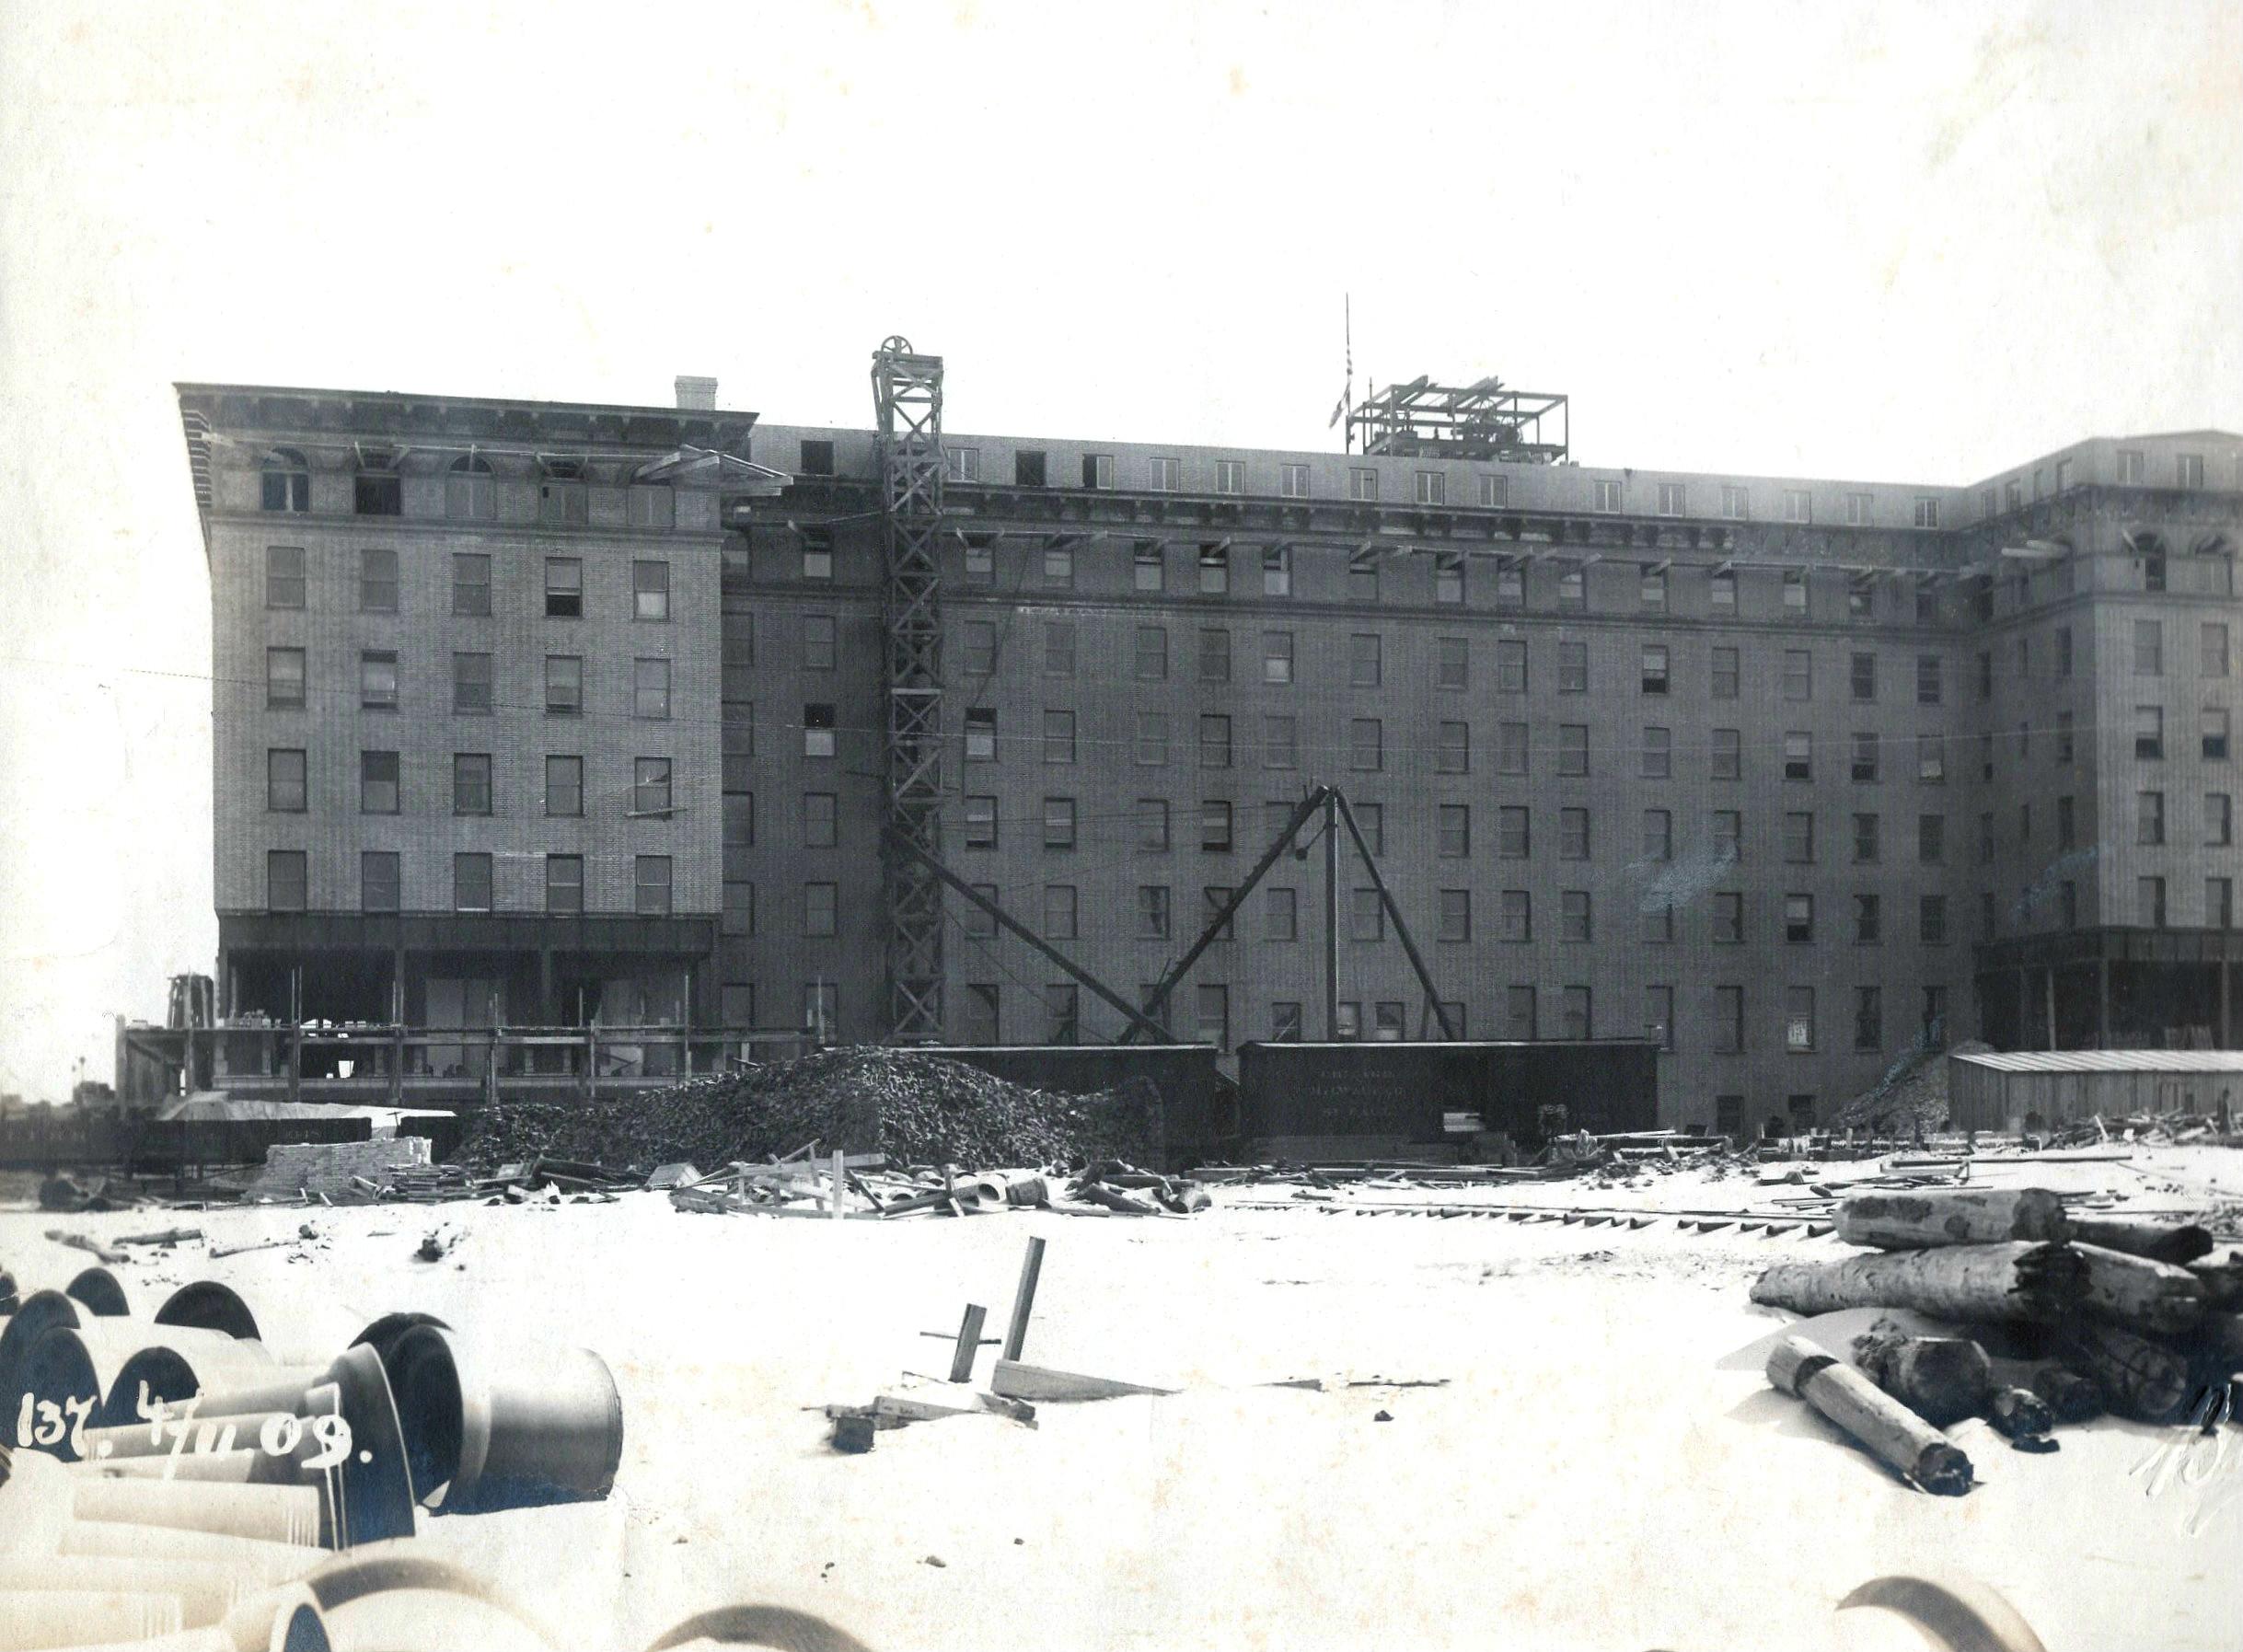 Hotel Nassau 1909 Construction June 19 (2).jpg